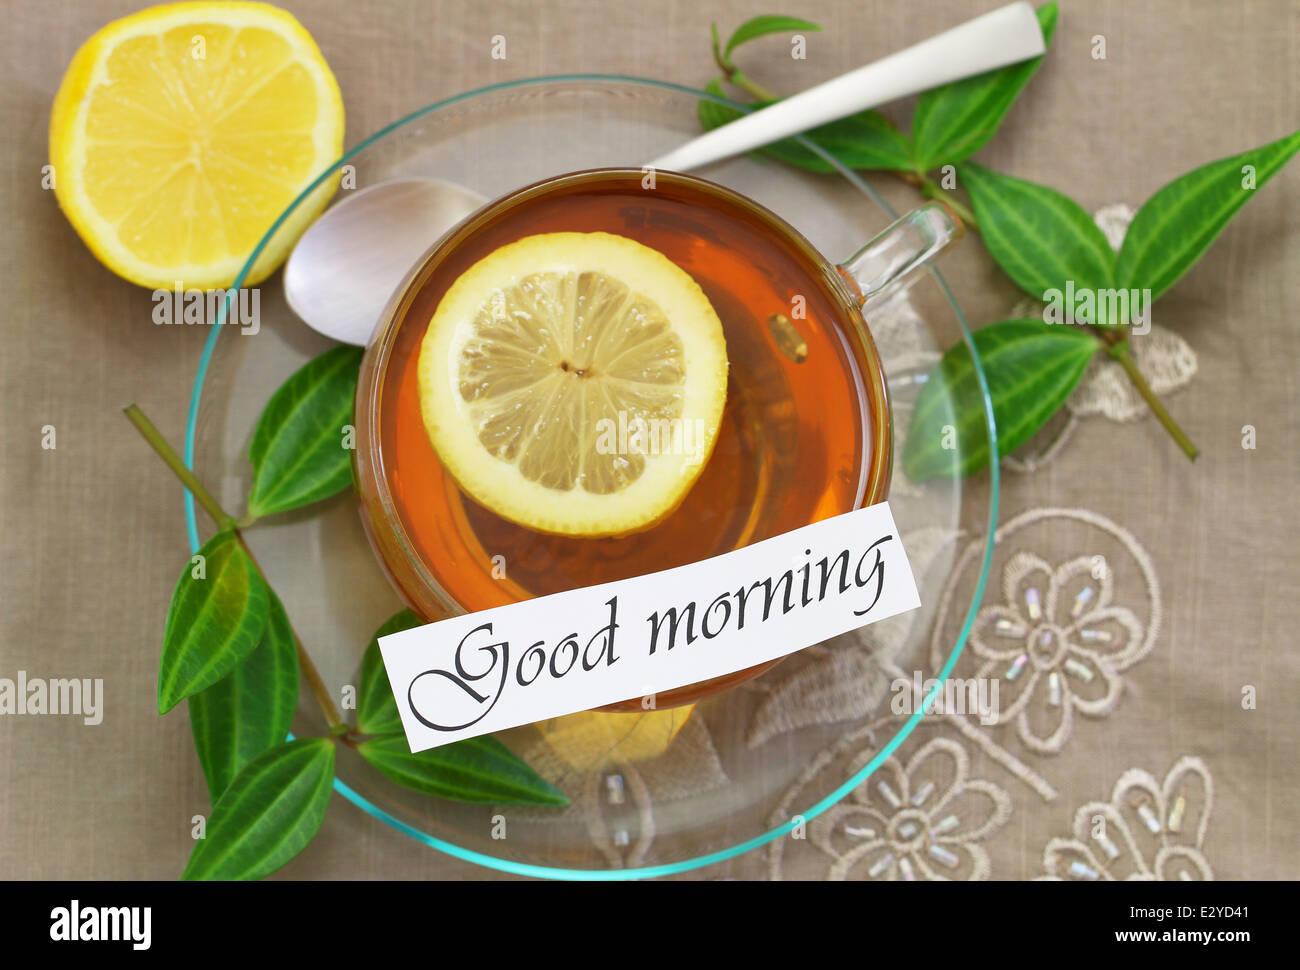 Guten Morgen Karte Mit Zitronen Tee Stockfoto Bild